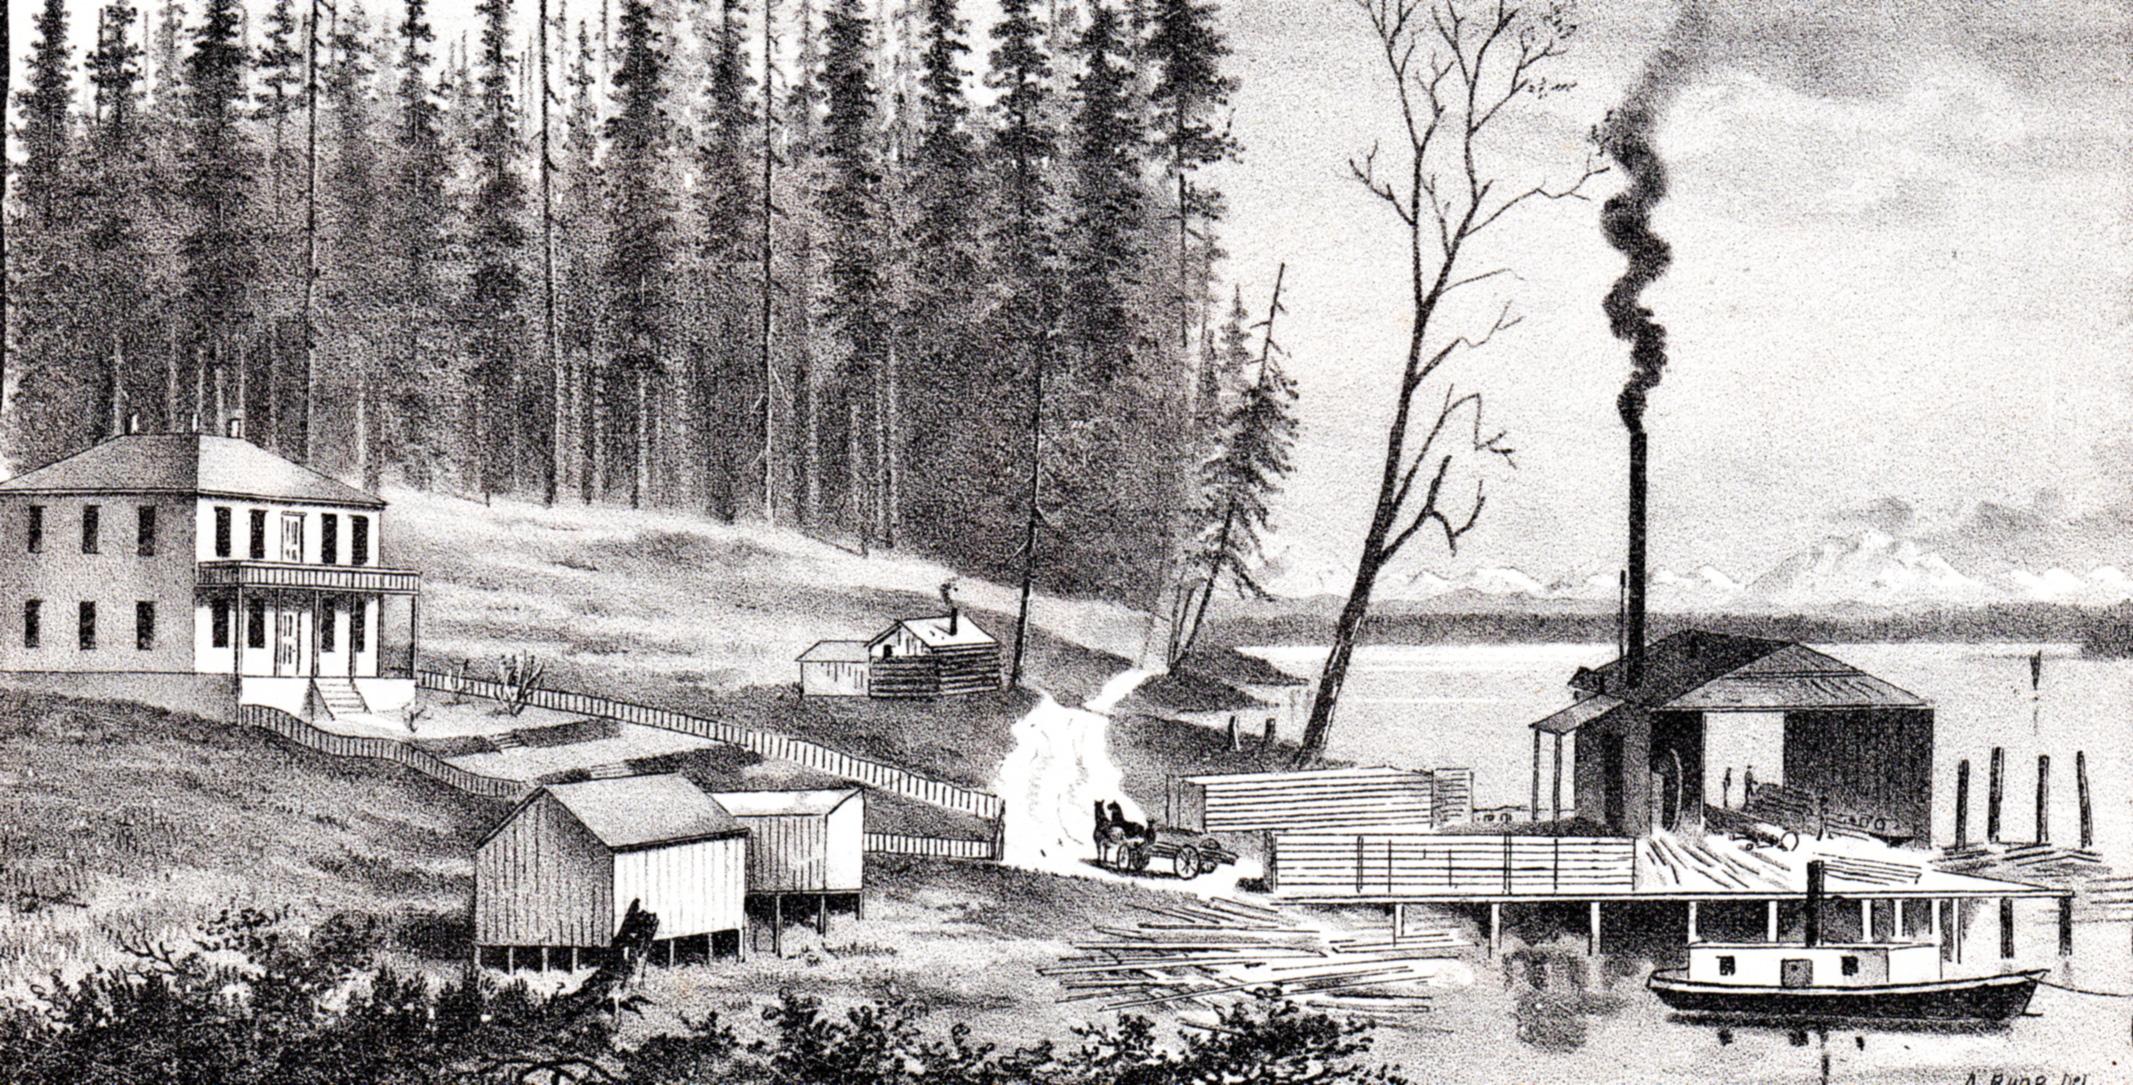 Antique prints of Seattle, Washington from West Shore Magazine